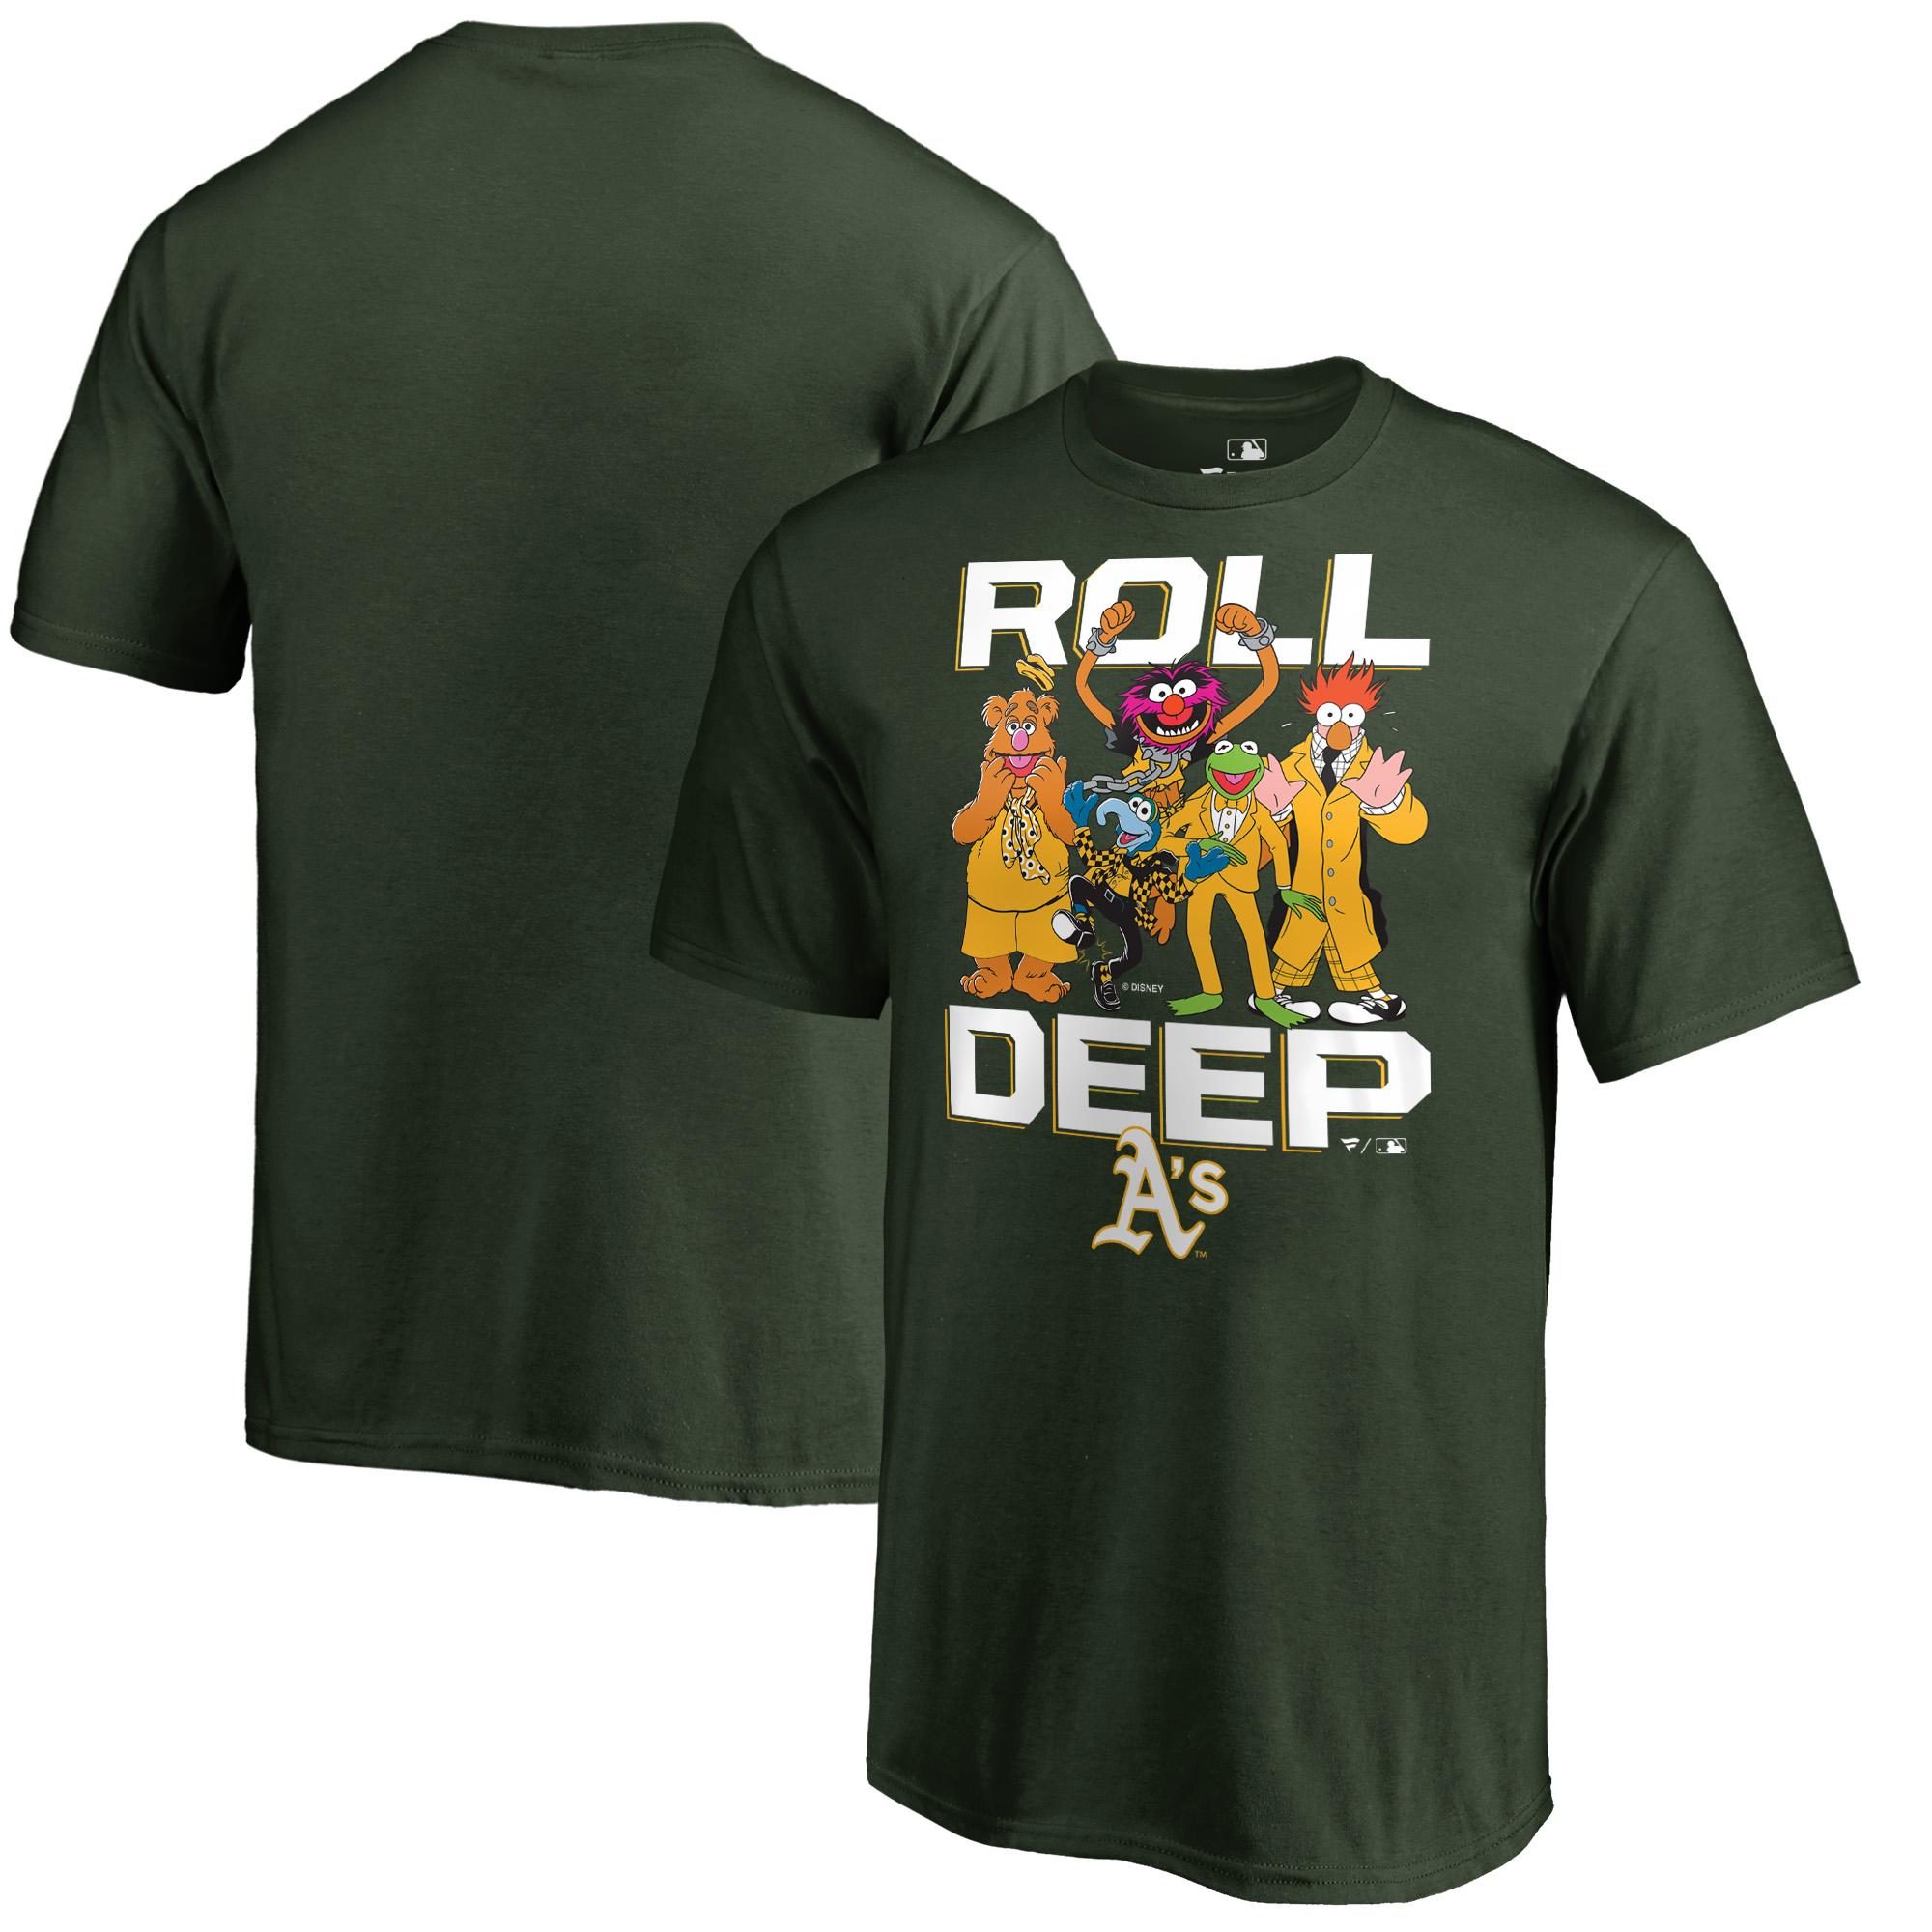 Oakland Athletics Fanatics Branded Youth Muppets Roll Deep T-Shirt - Green